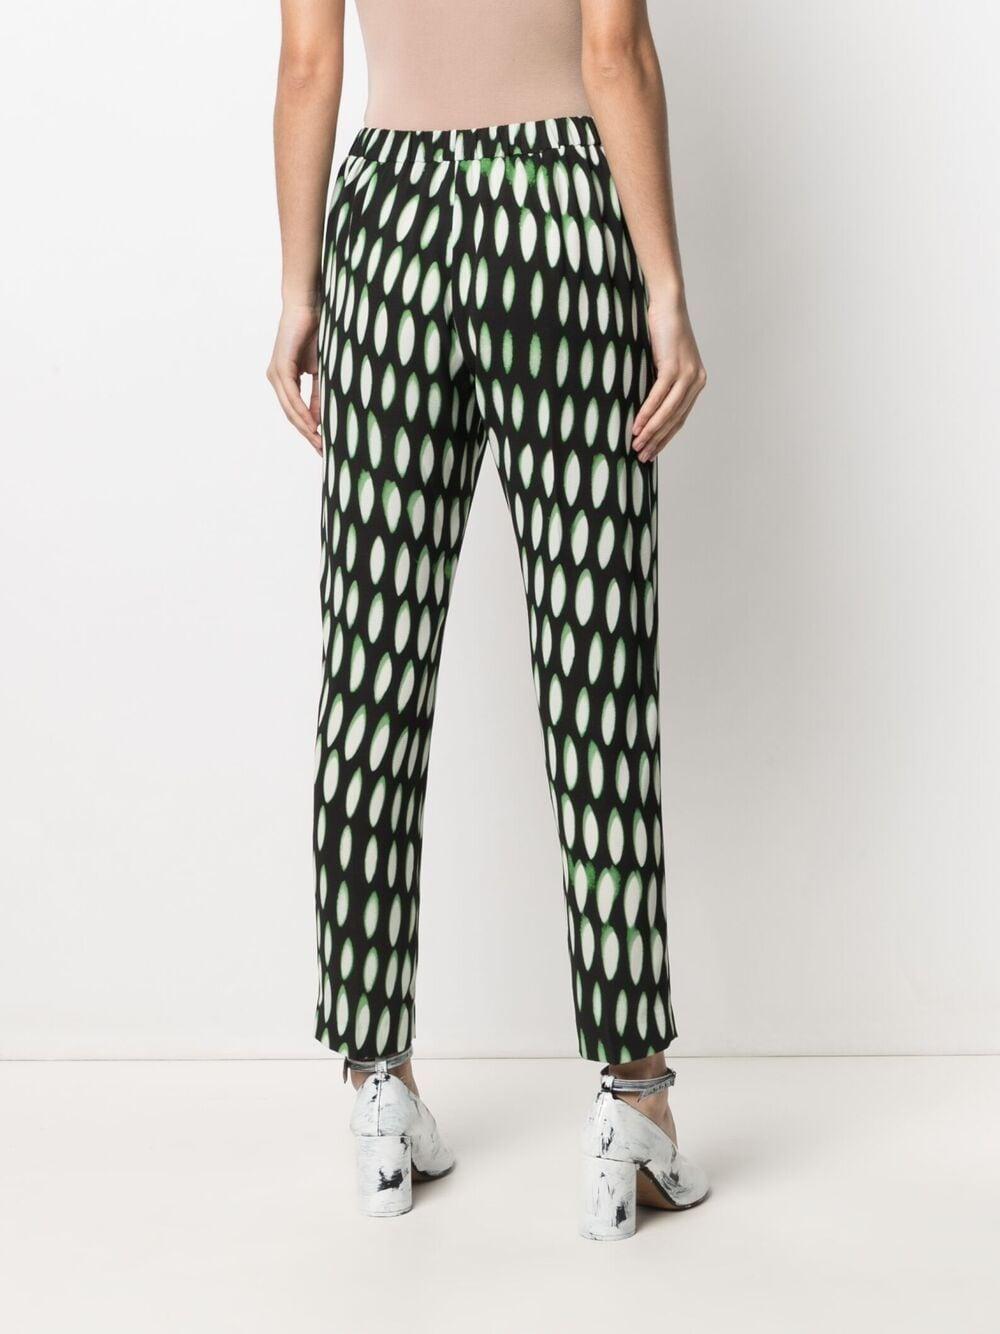 Black and green silk abstract-print silk trousers   DRIES VAN NOTEN |  | PALMIRA-2010-10909900